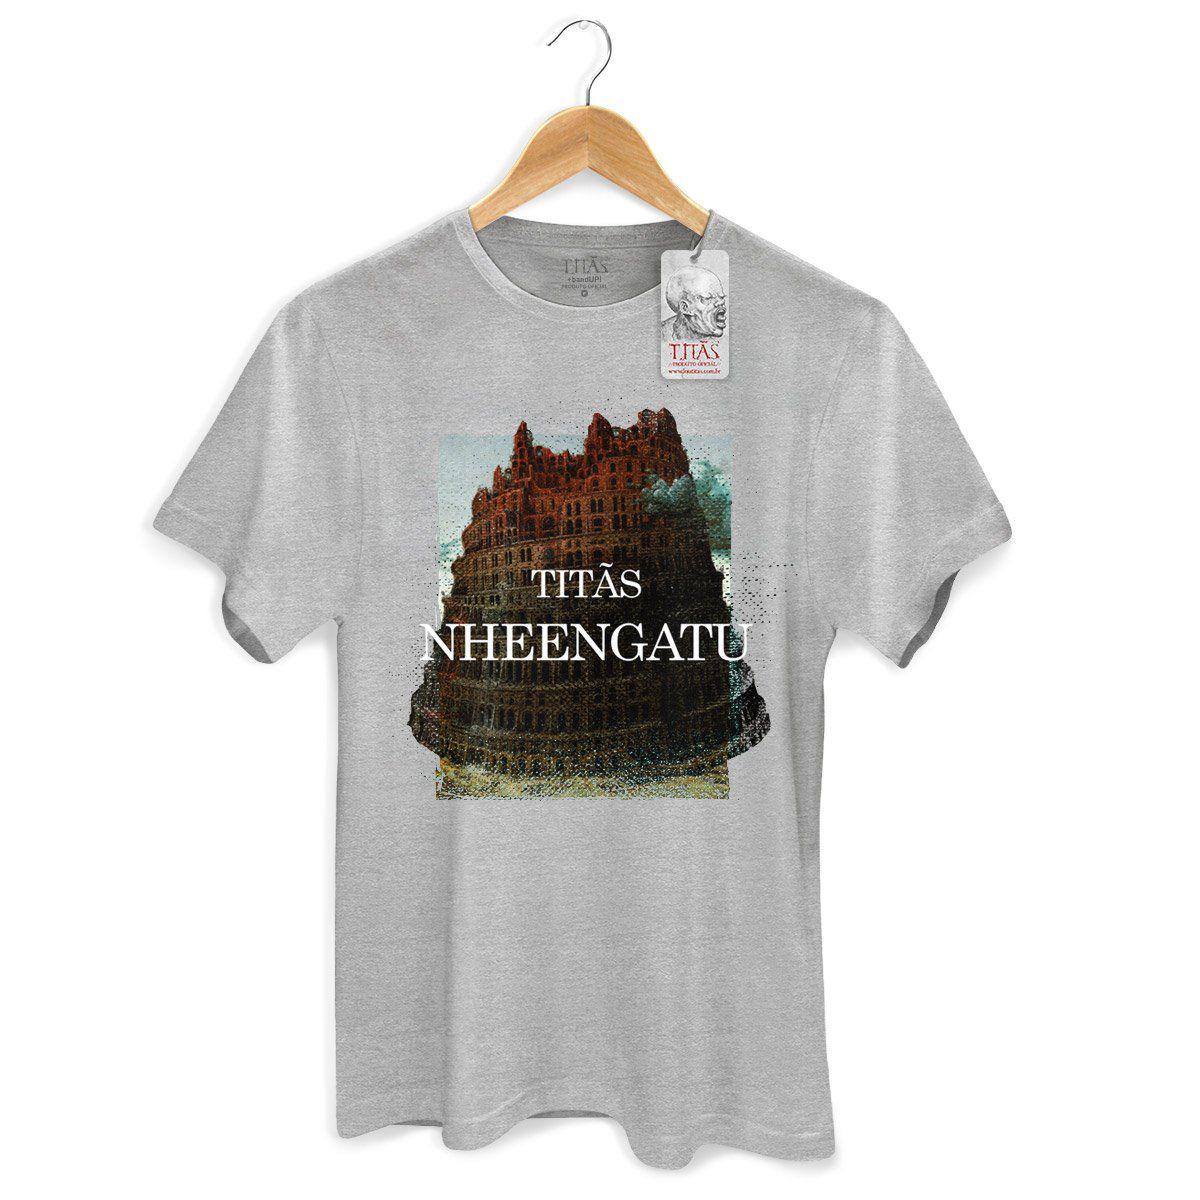 Camiseta Masculina Titãs Nheengatu Capa  - bandUP Store Marketplace